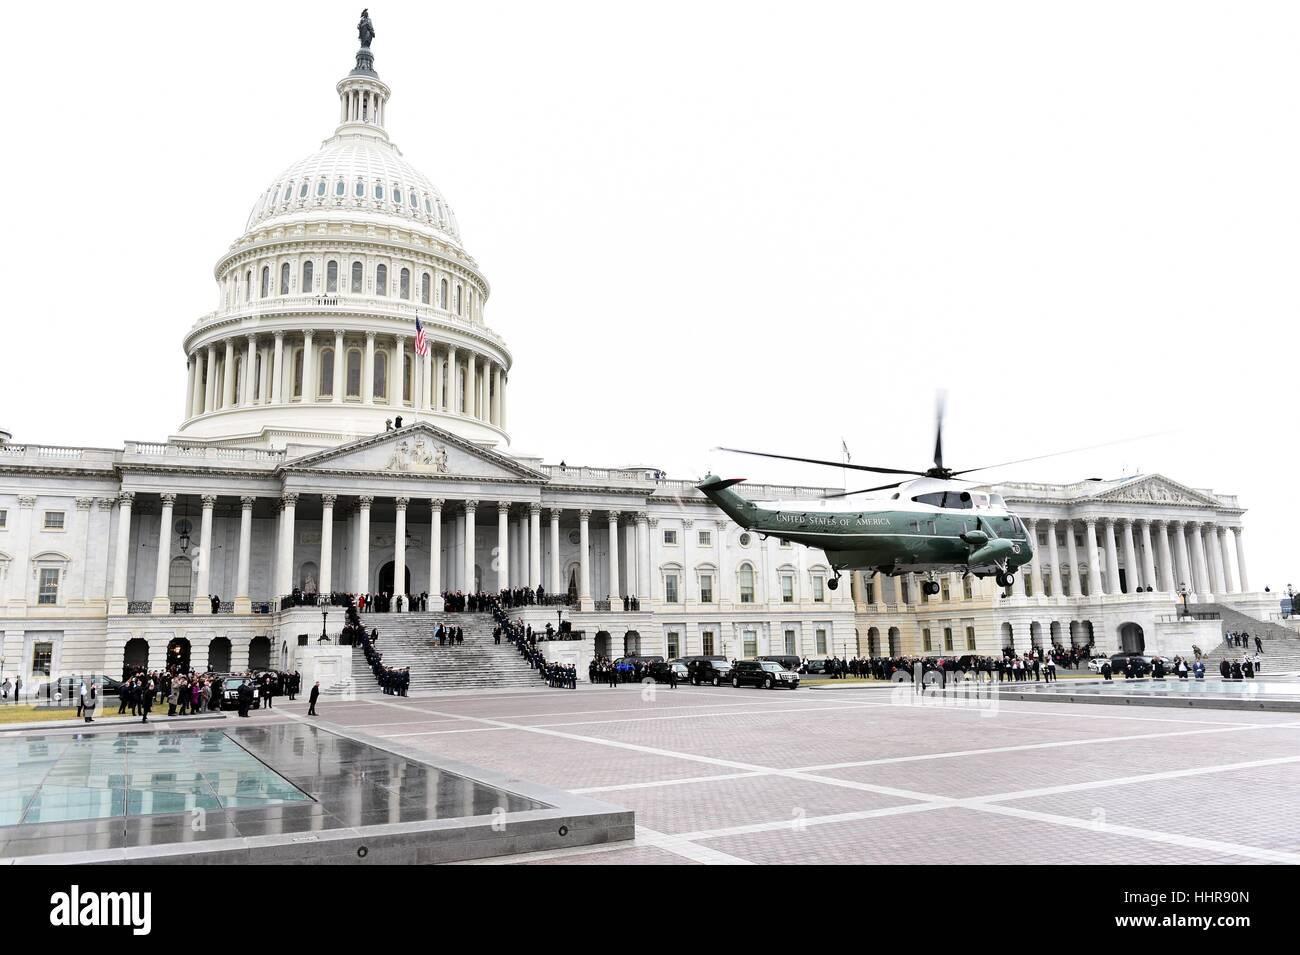 Washington, USA. 20. Januar 2017. Der Hubschrauber mit ehemaliger Präsident Barack Obama lässt U.S. Capitol Stockbild